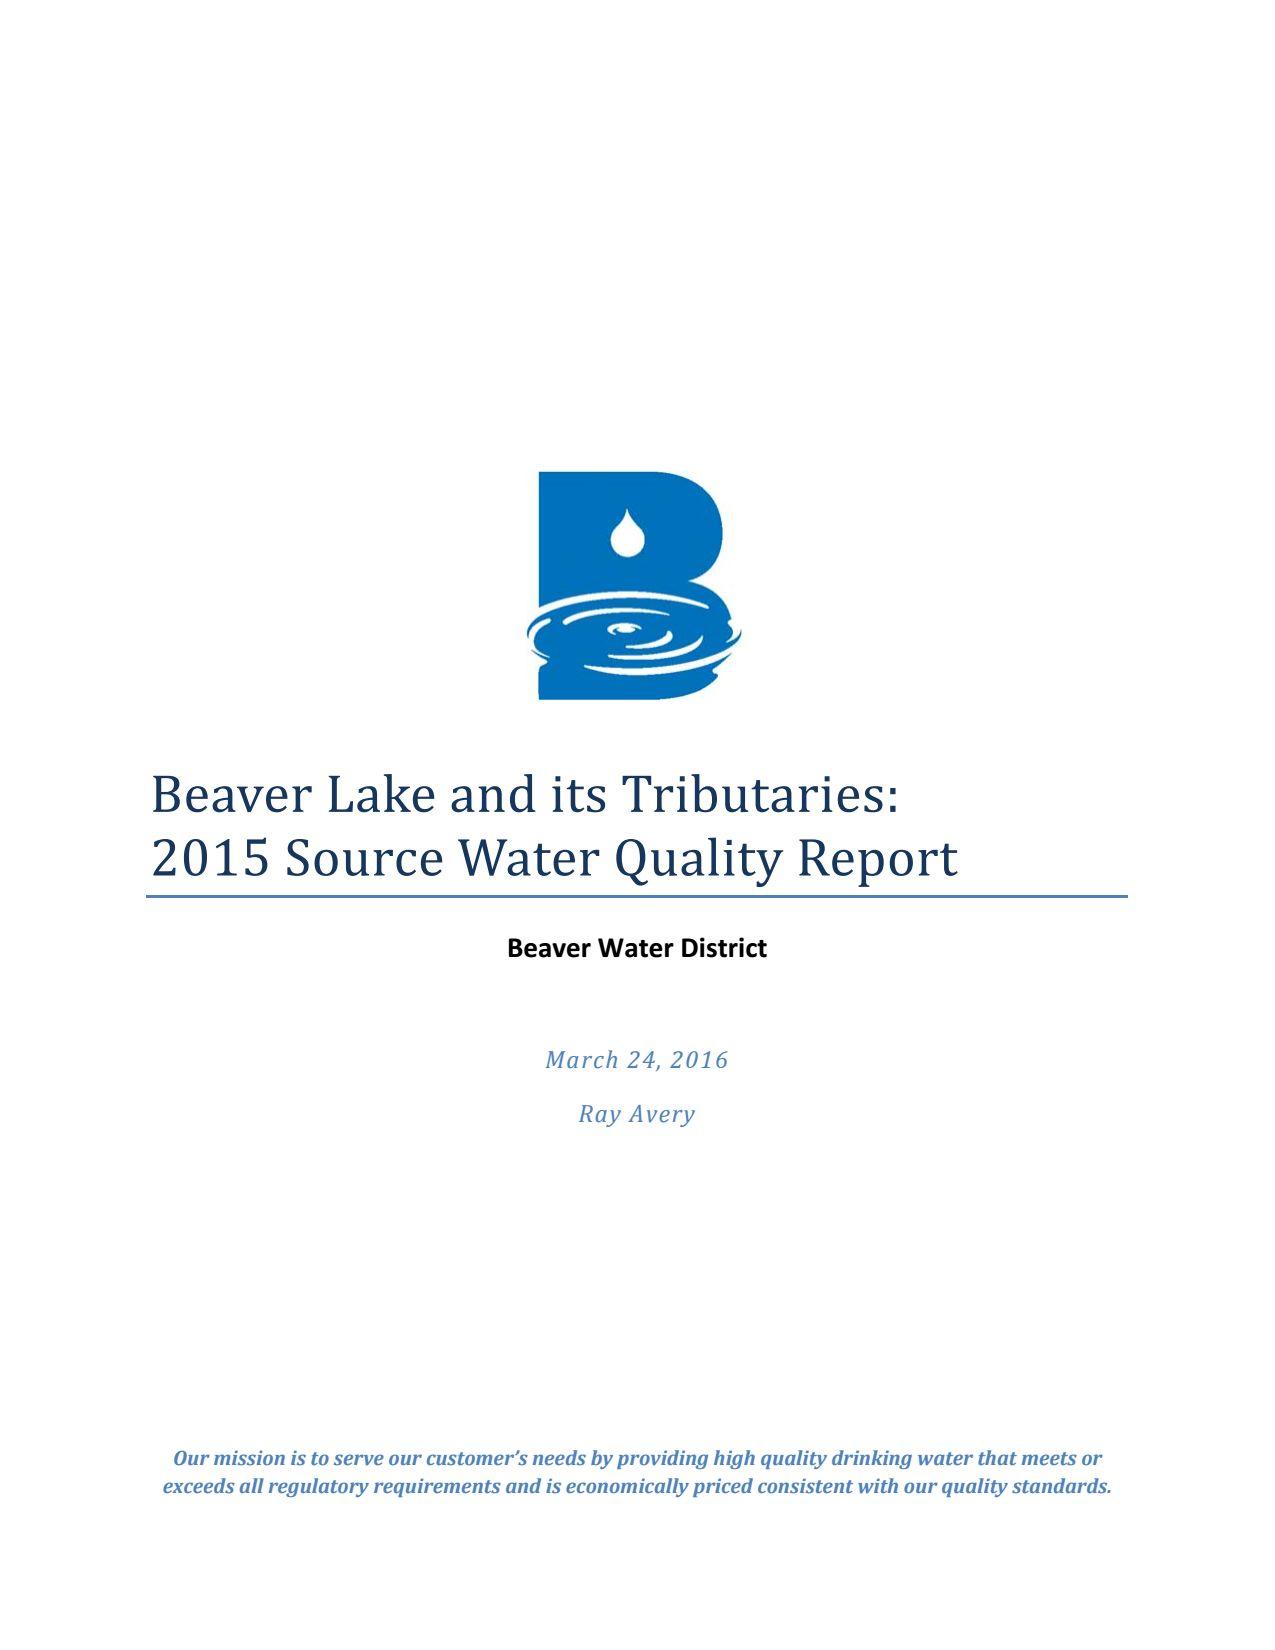 2015 Beaver Lake Water Quality Report